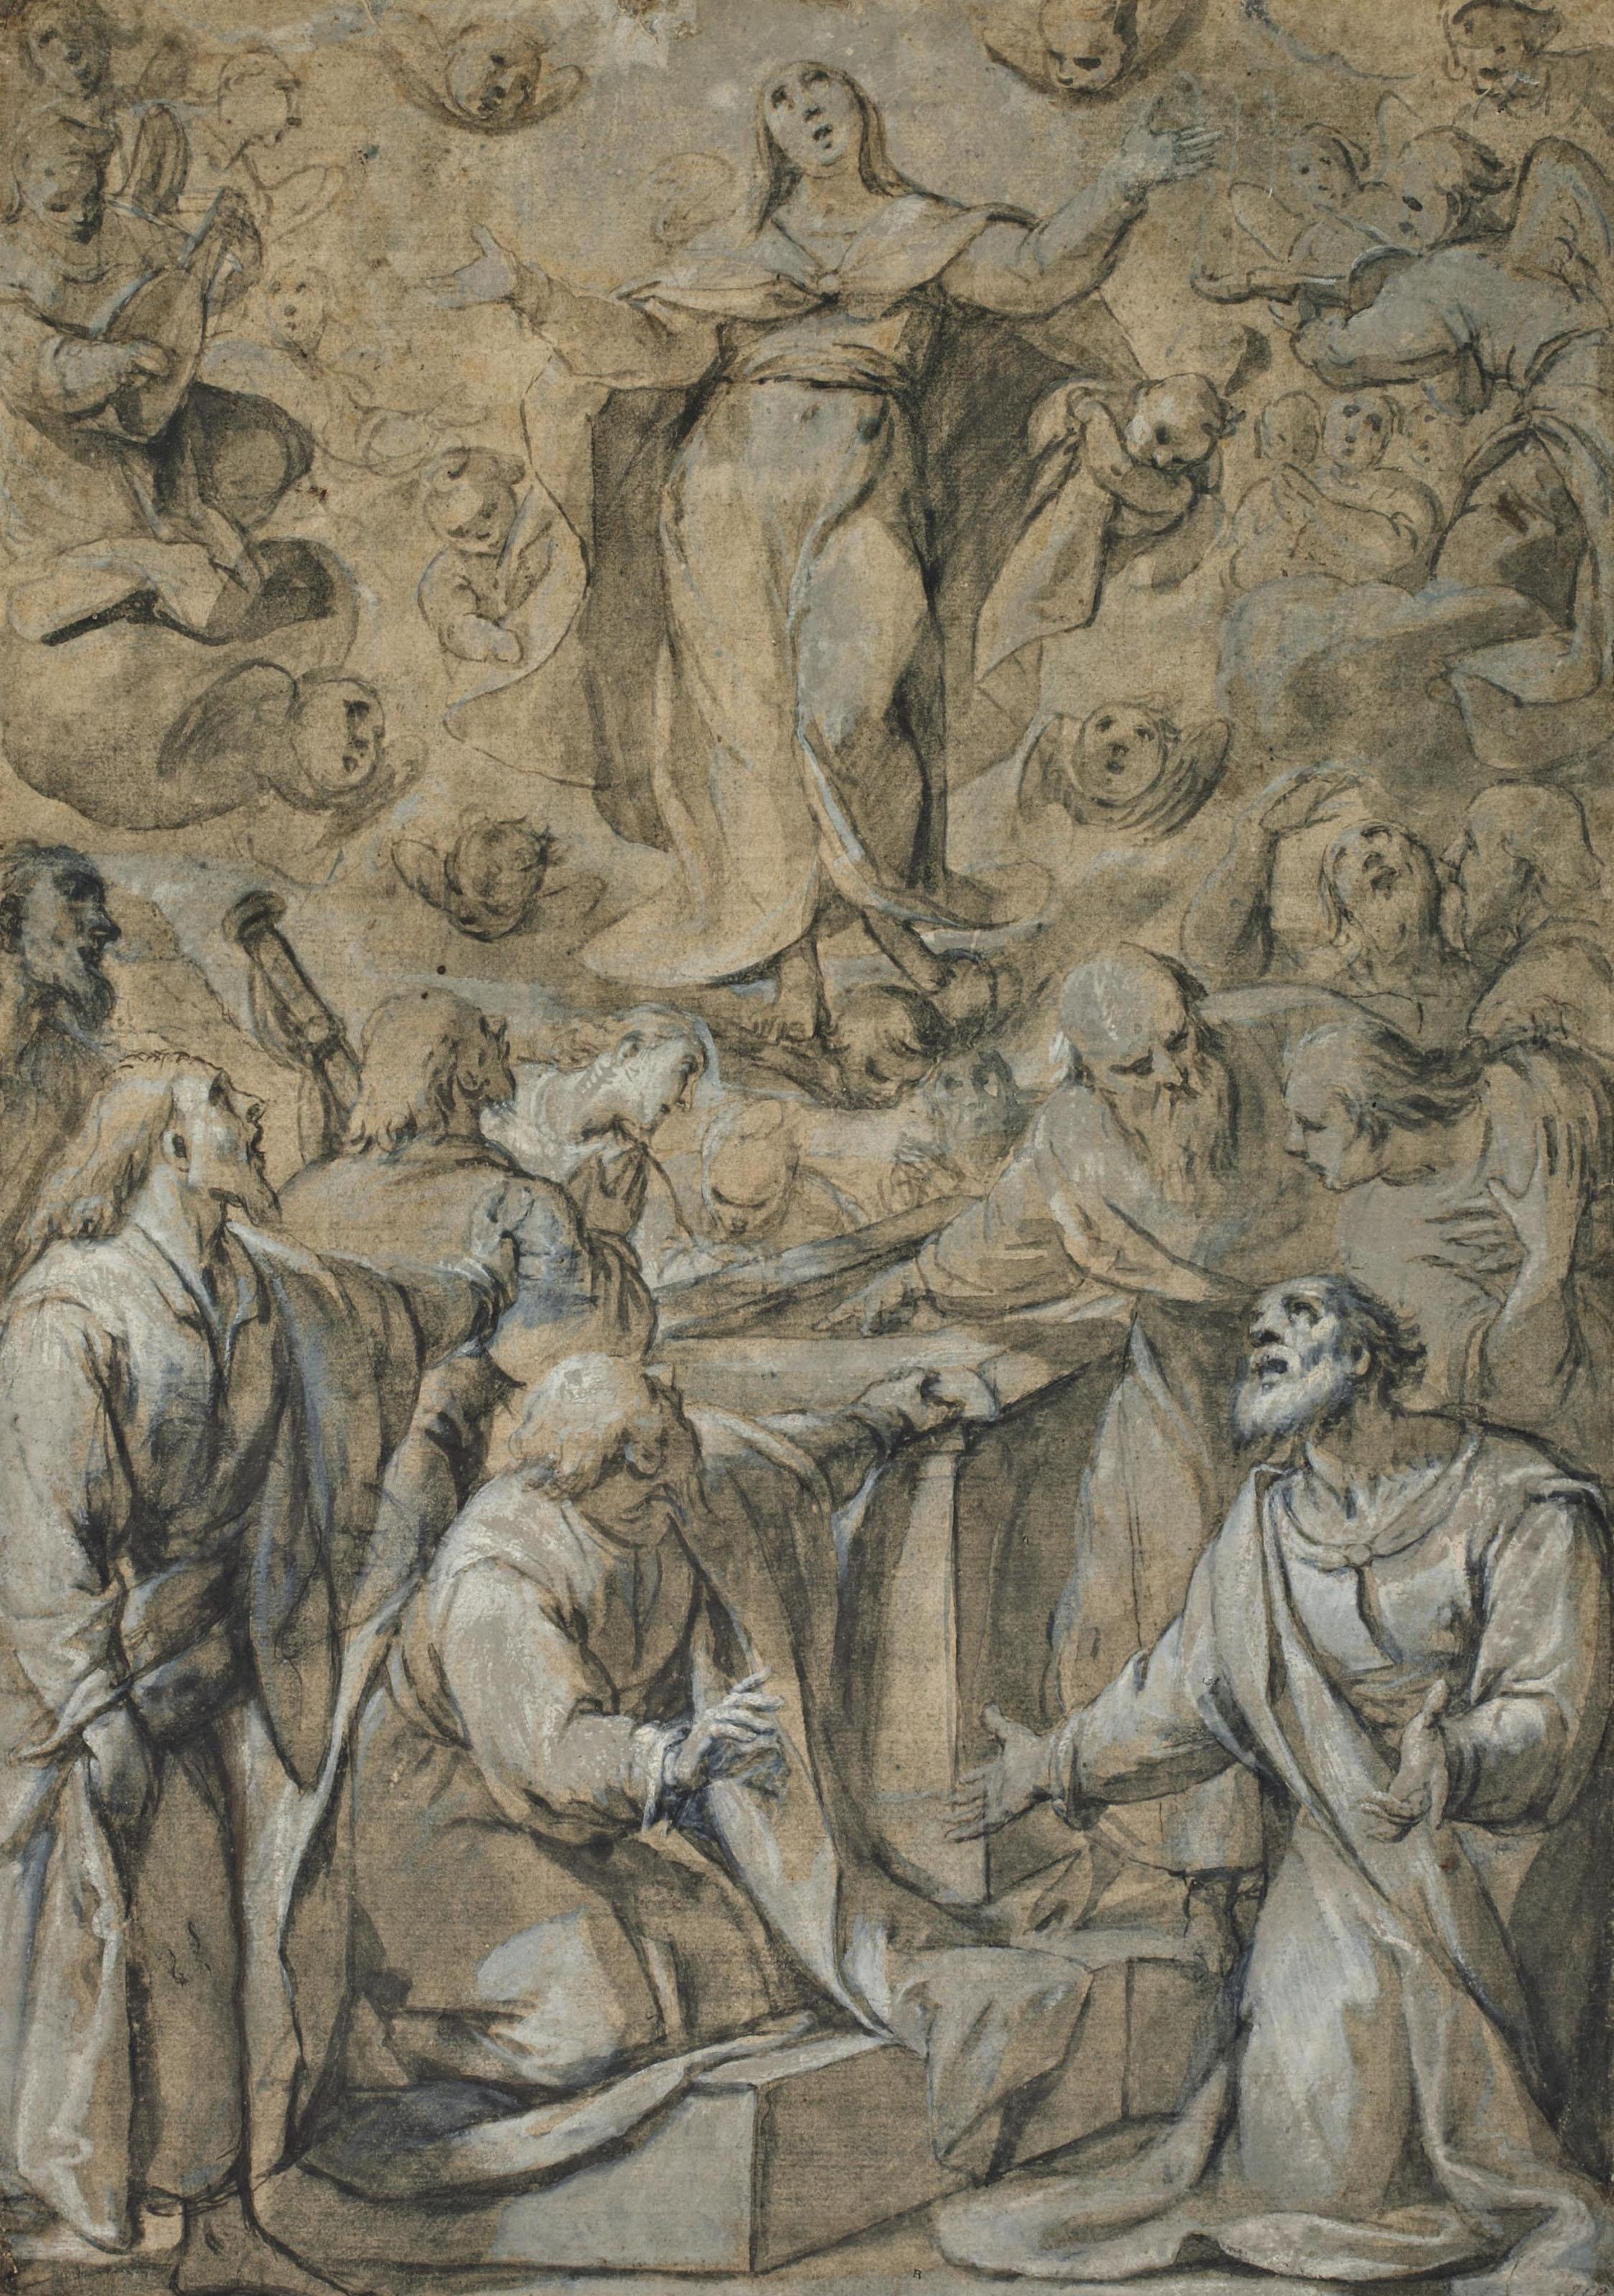 Pietro SORRI (San Giosmé 1556-